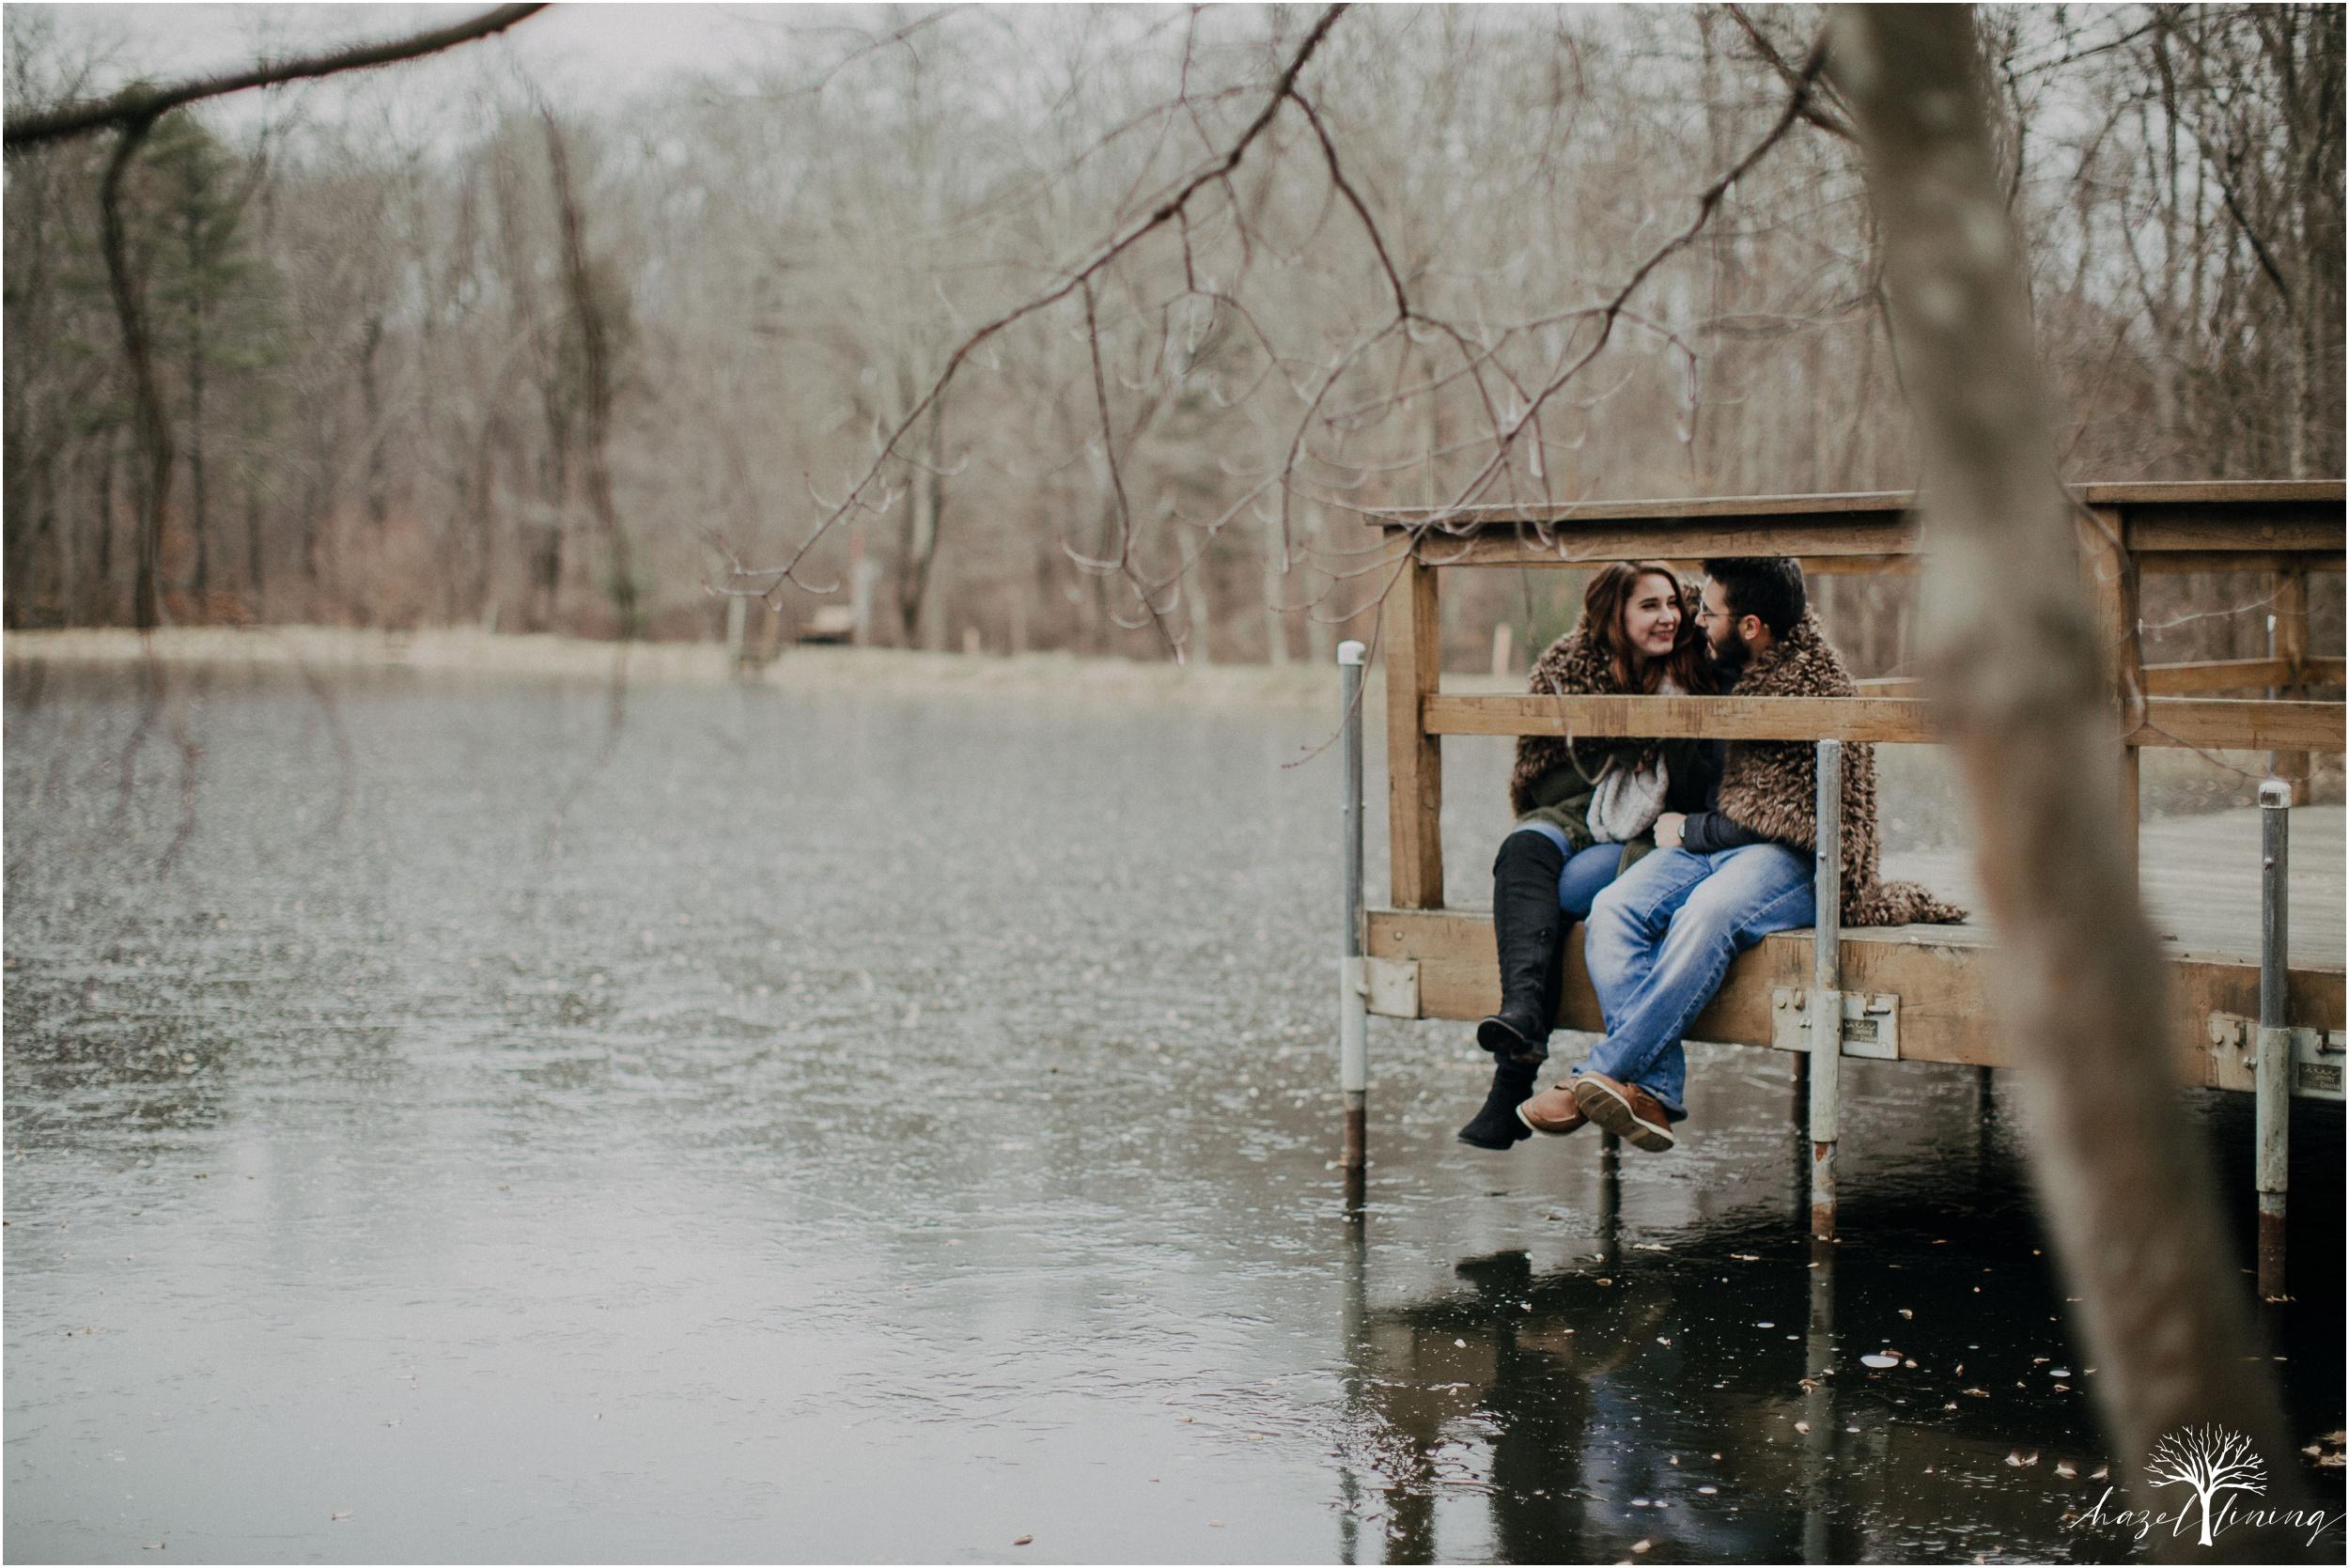 evan-maggie-lesh-one-year-anniversary-winter-shoot-camp-menolan-pennsylvania_0044.jpg